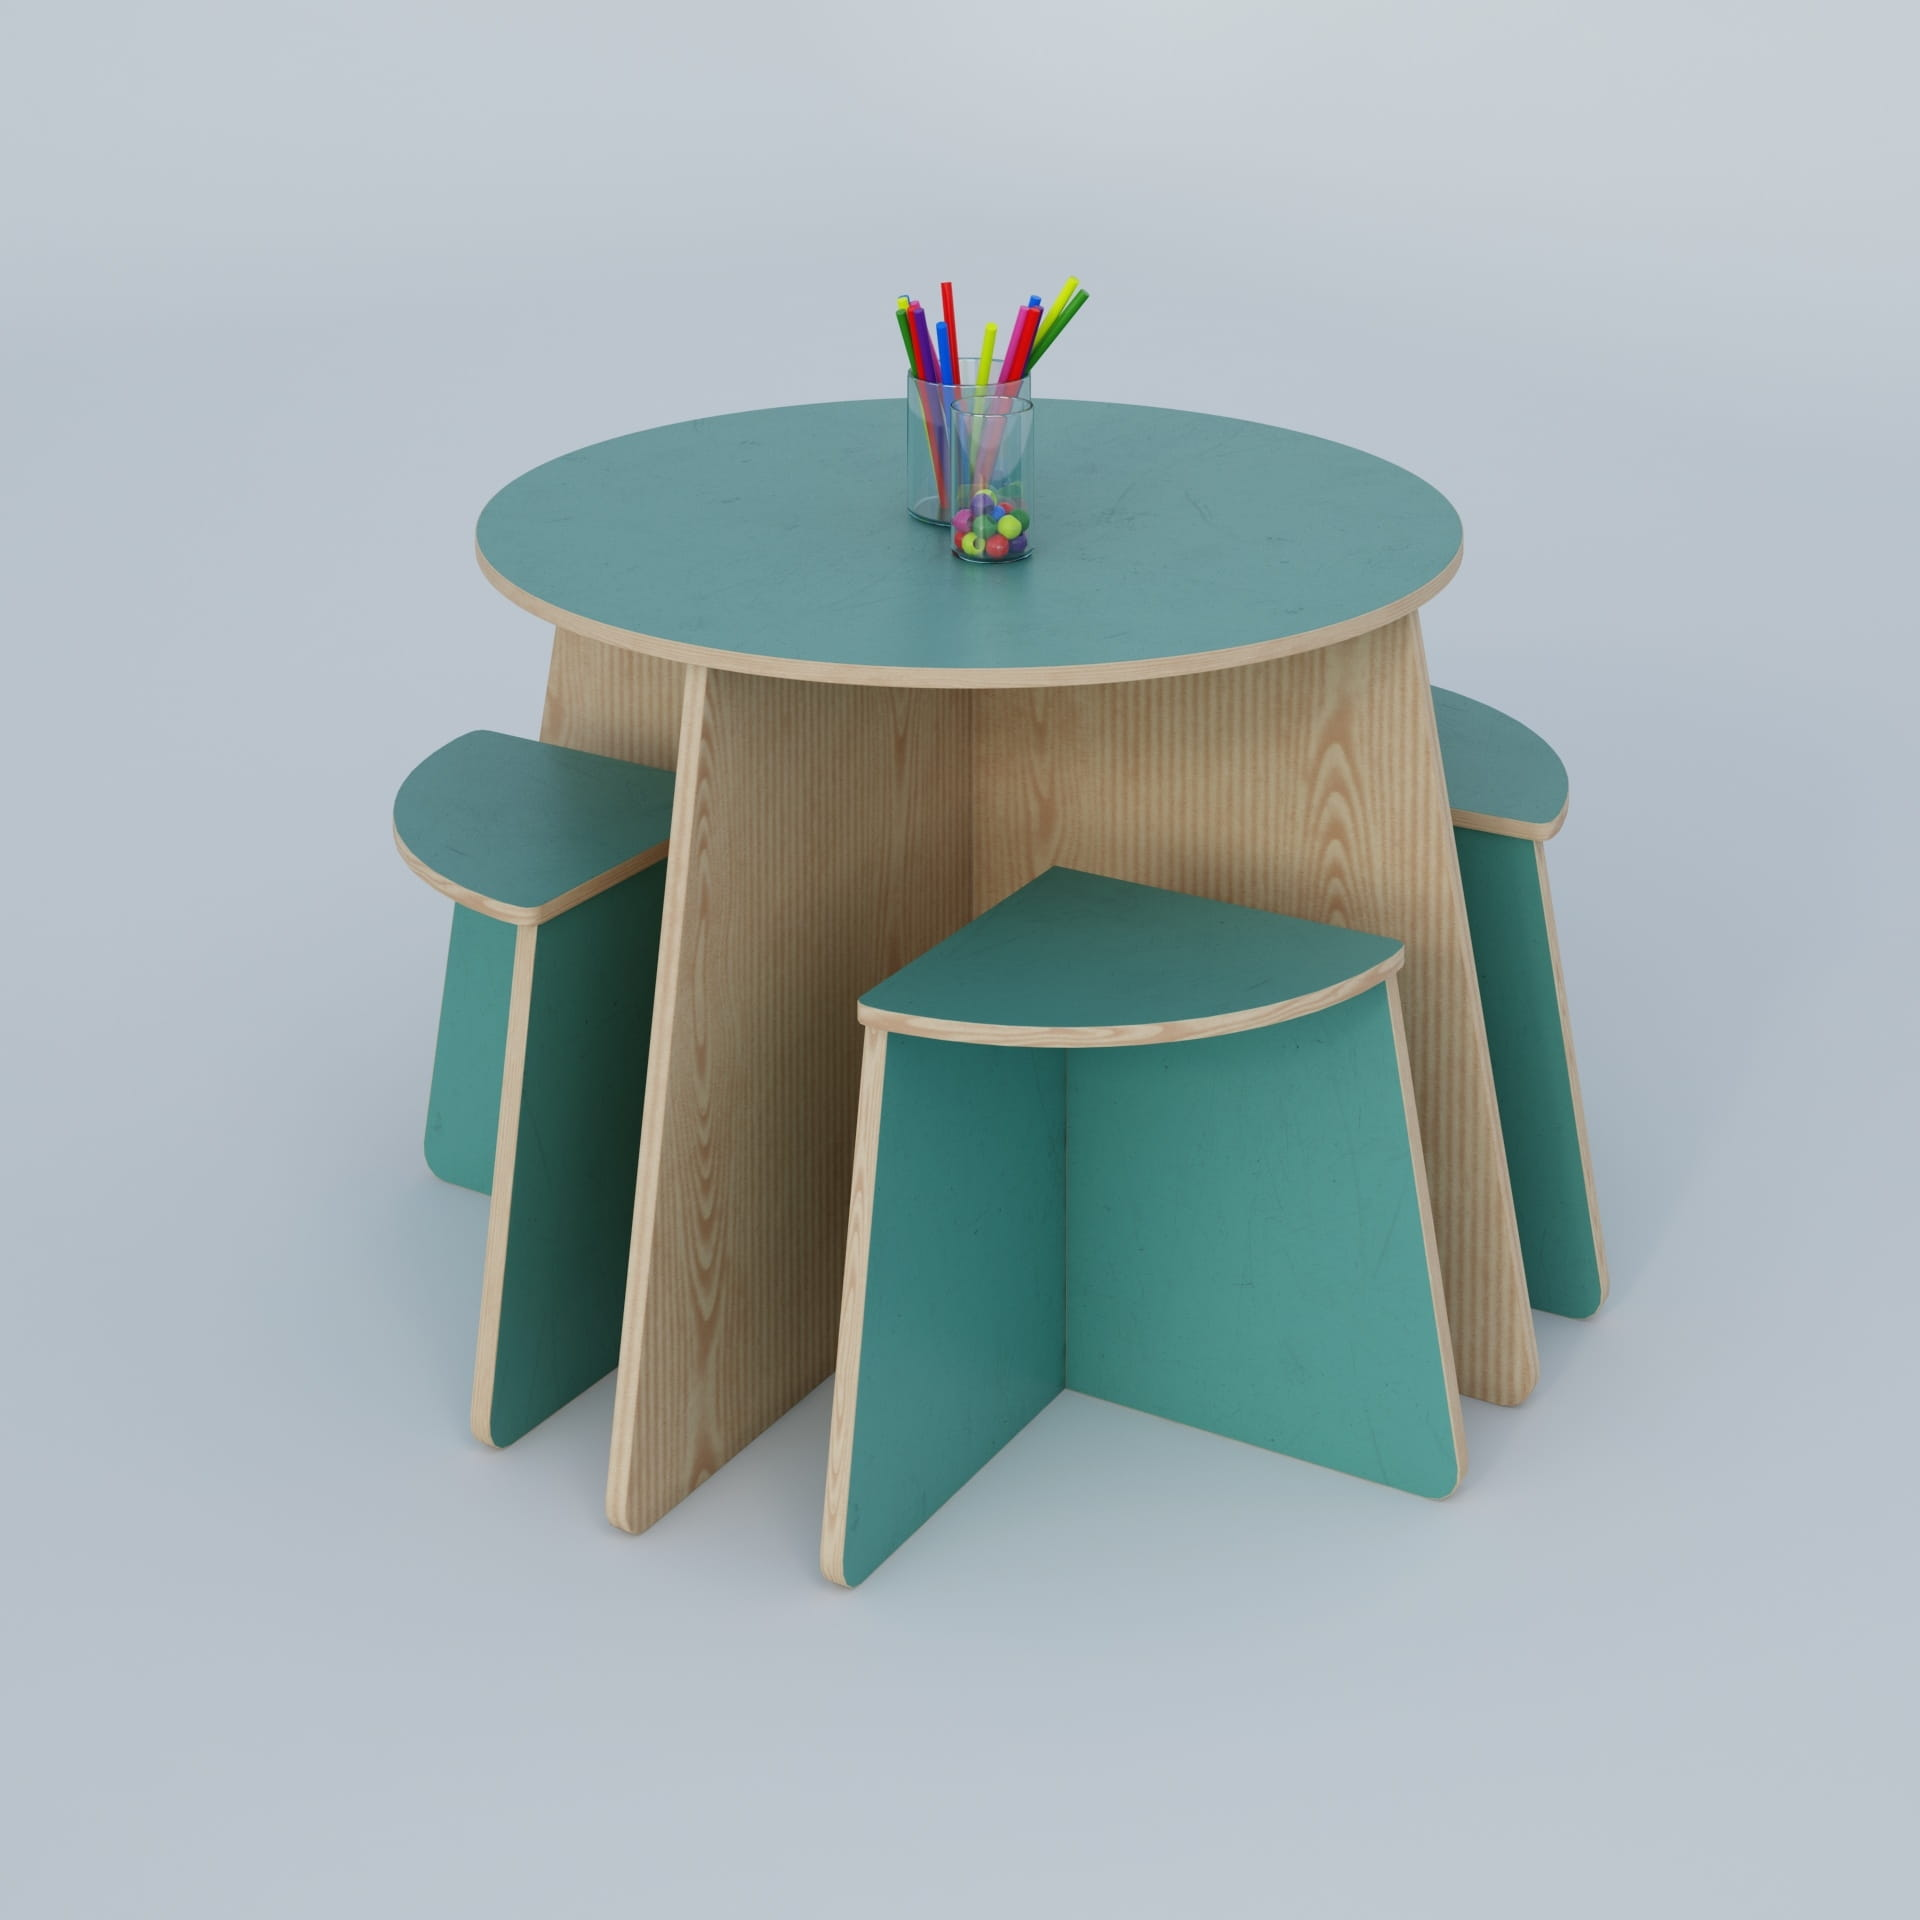 furniture 21 AM244 Archmodels